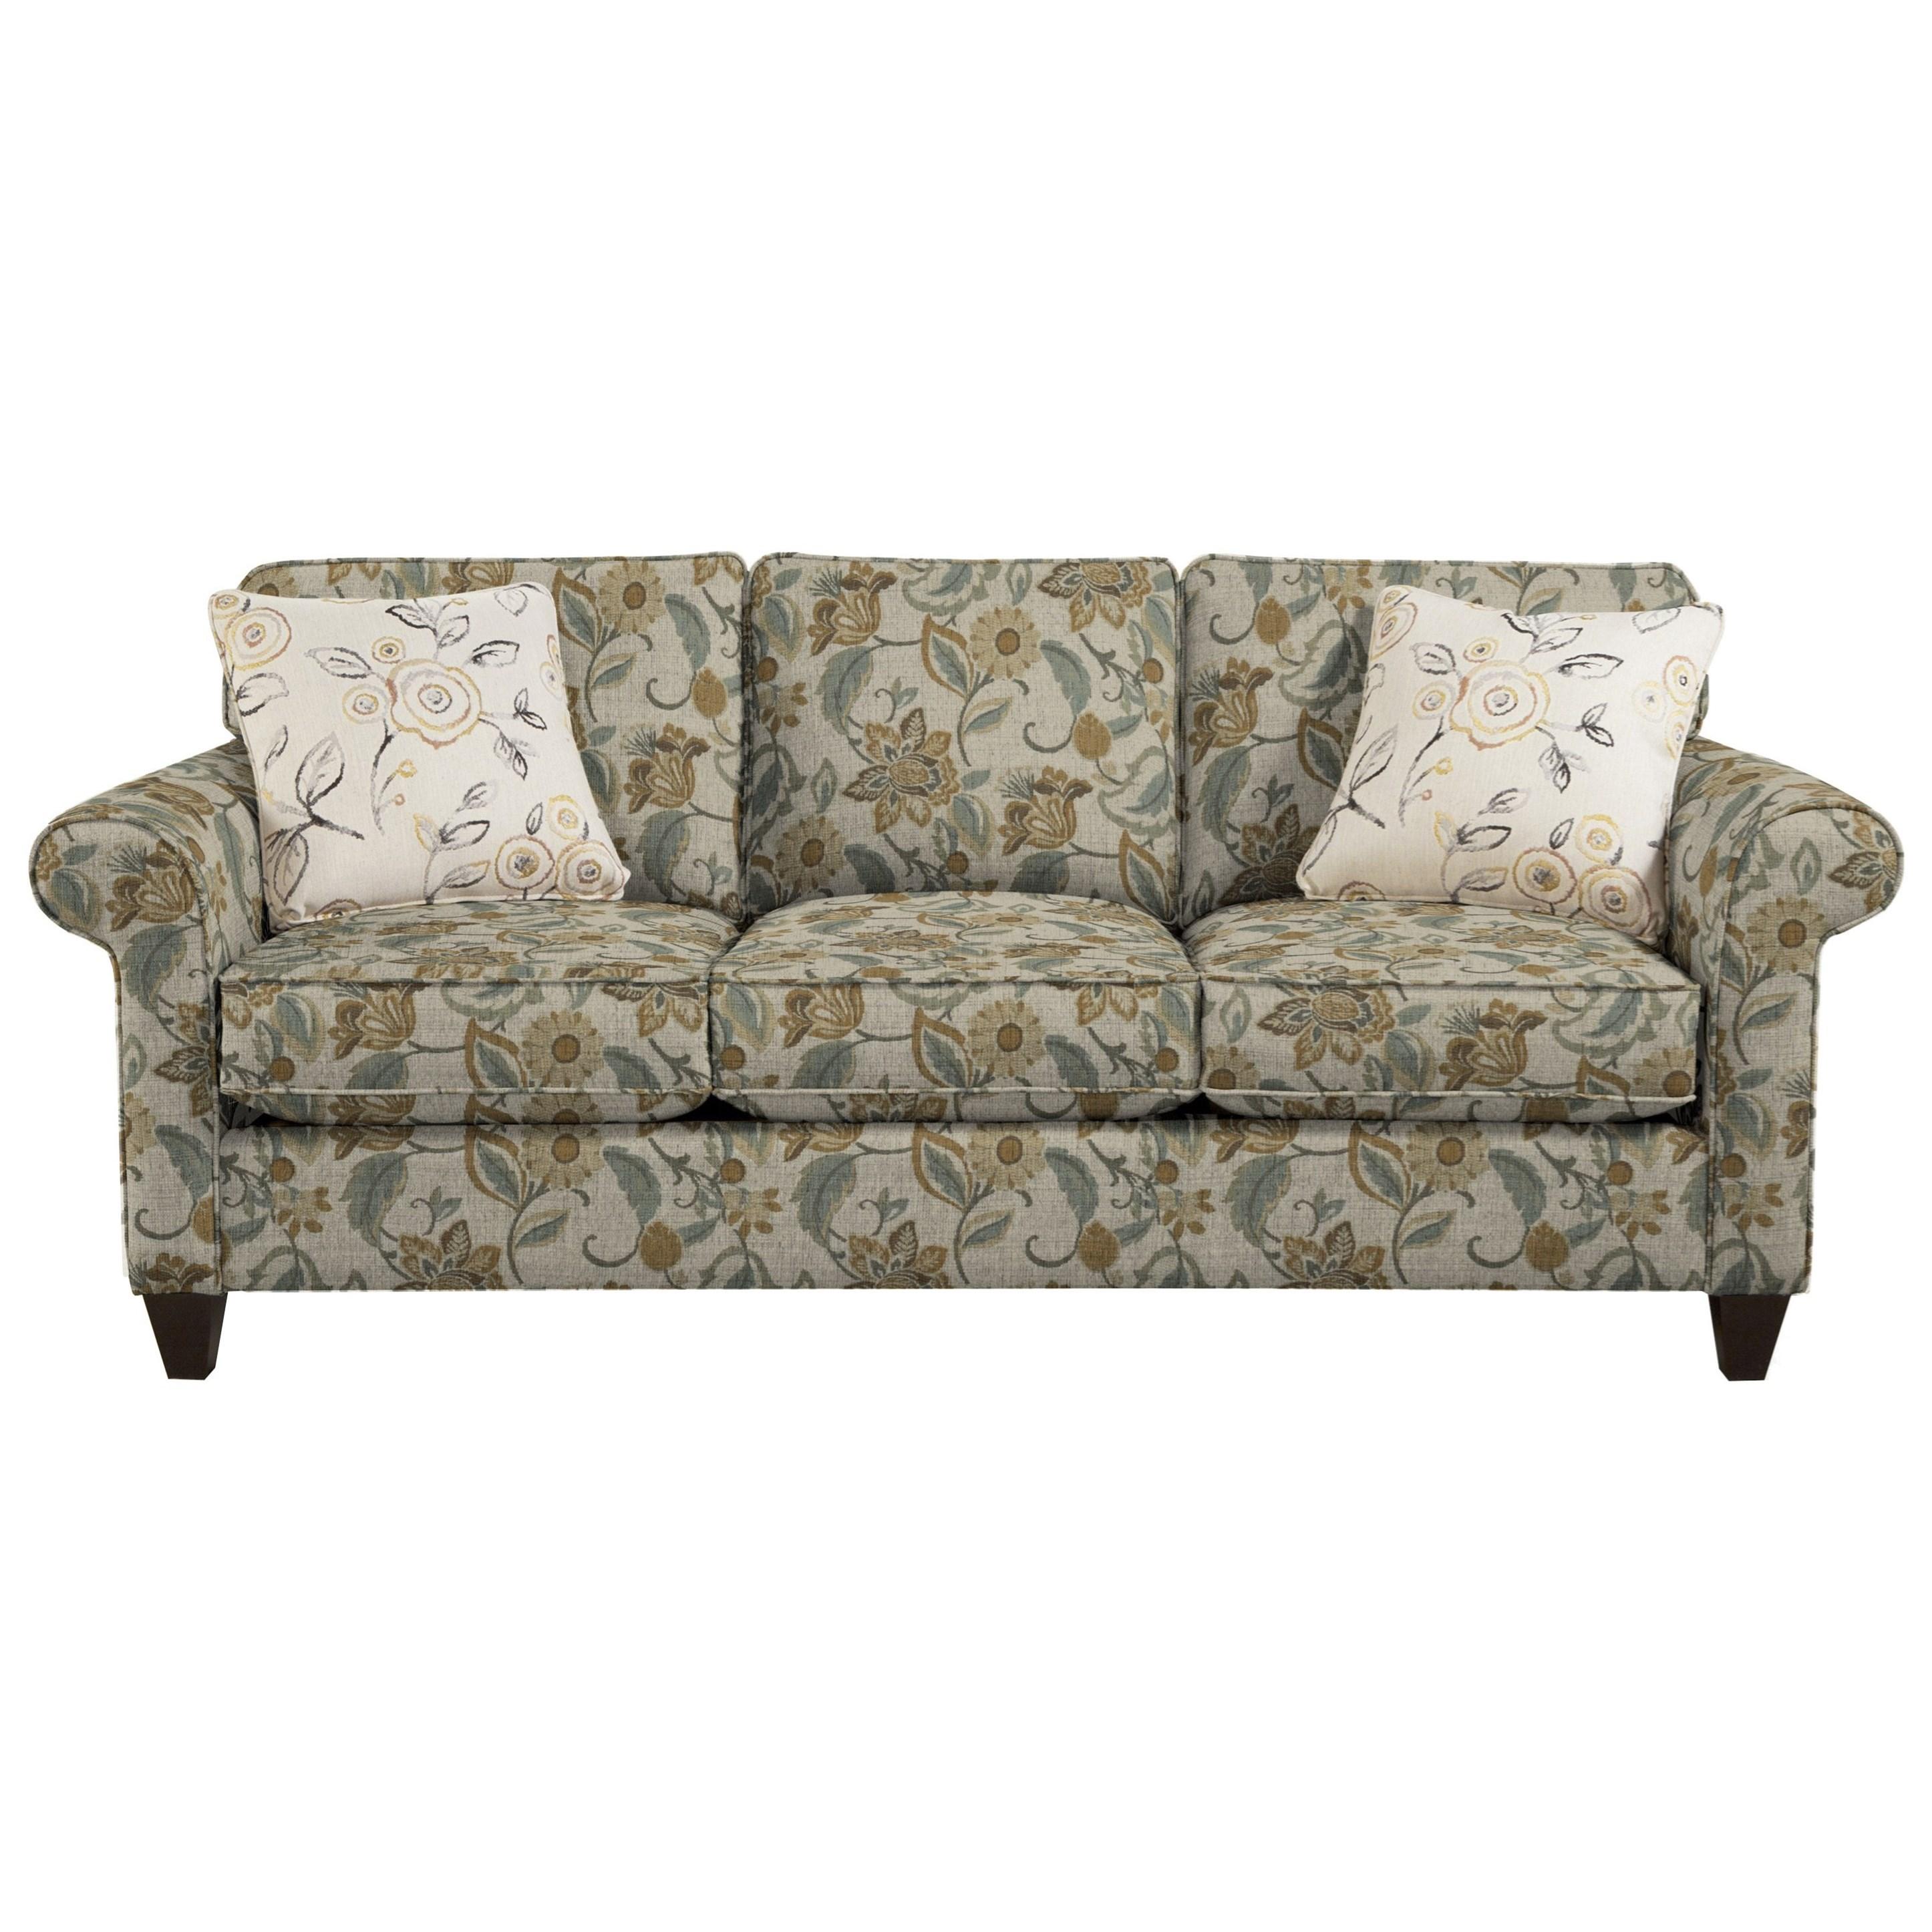 7421 Sofa by Craftmaster at Turk Furniture